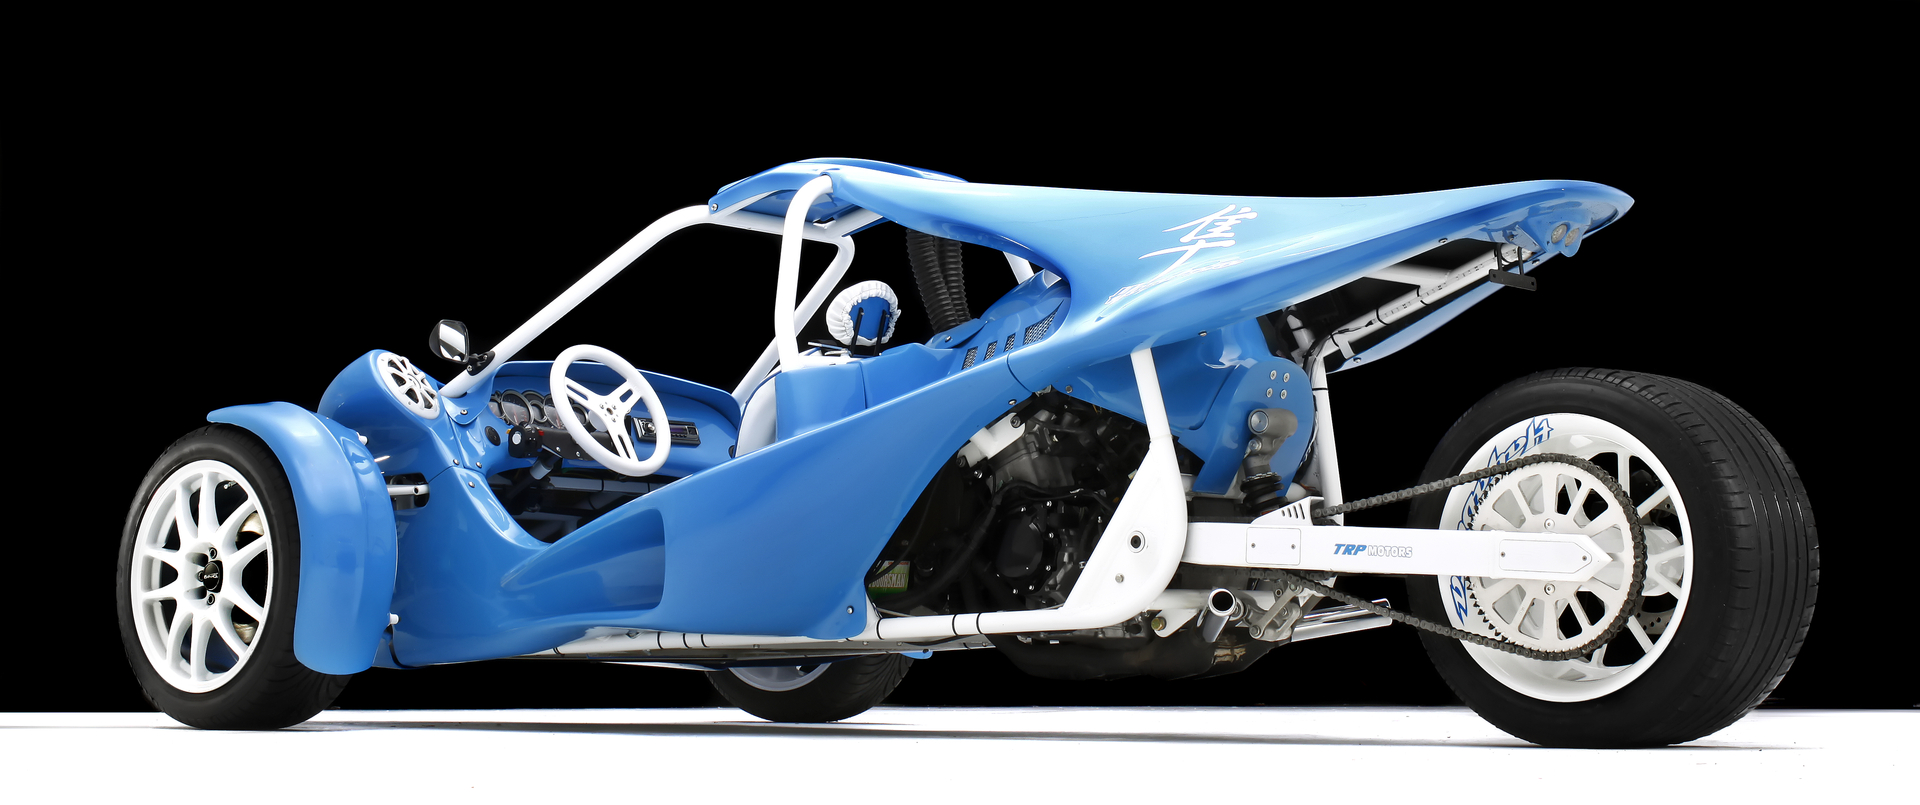 Asanti Wheels For Sale On Craigslist - 2019-2020 Top Car ...